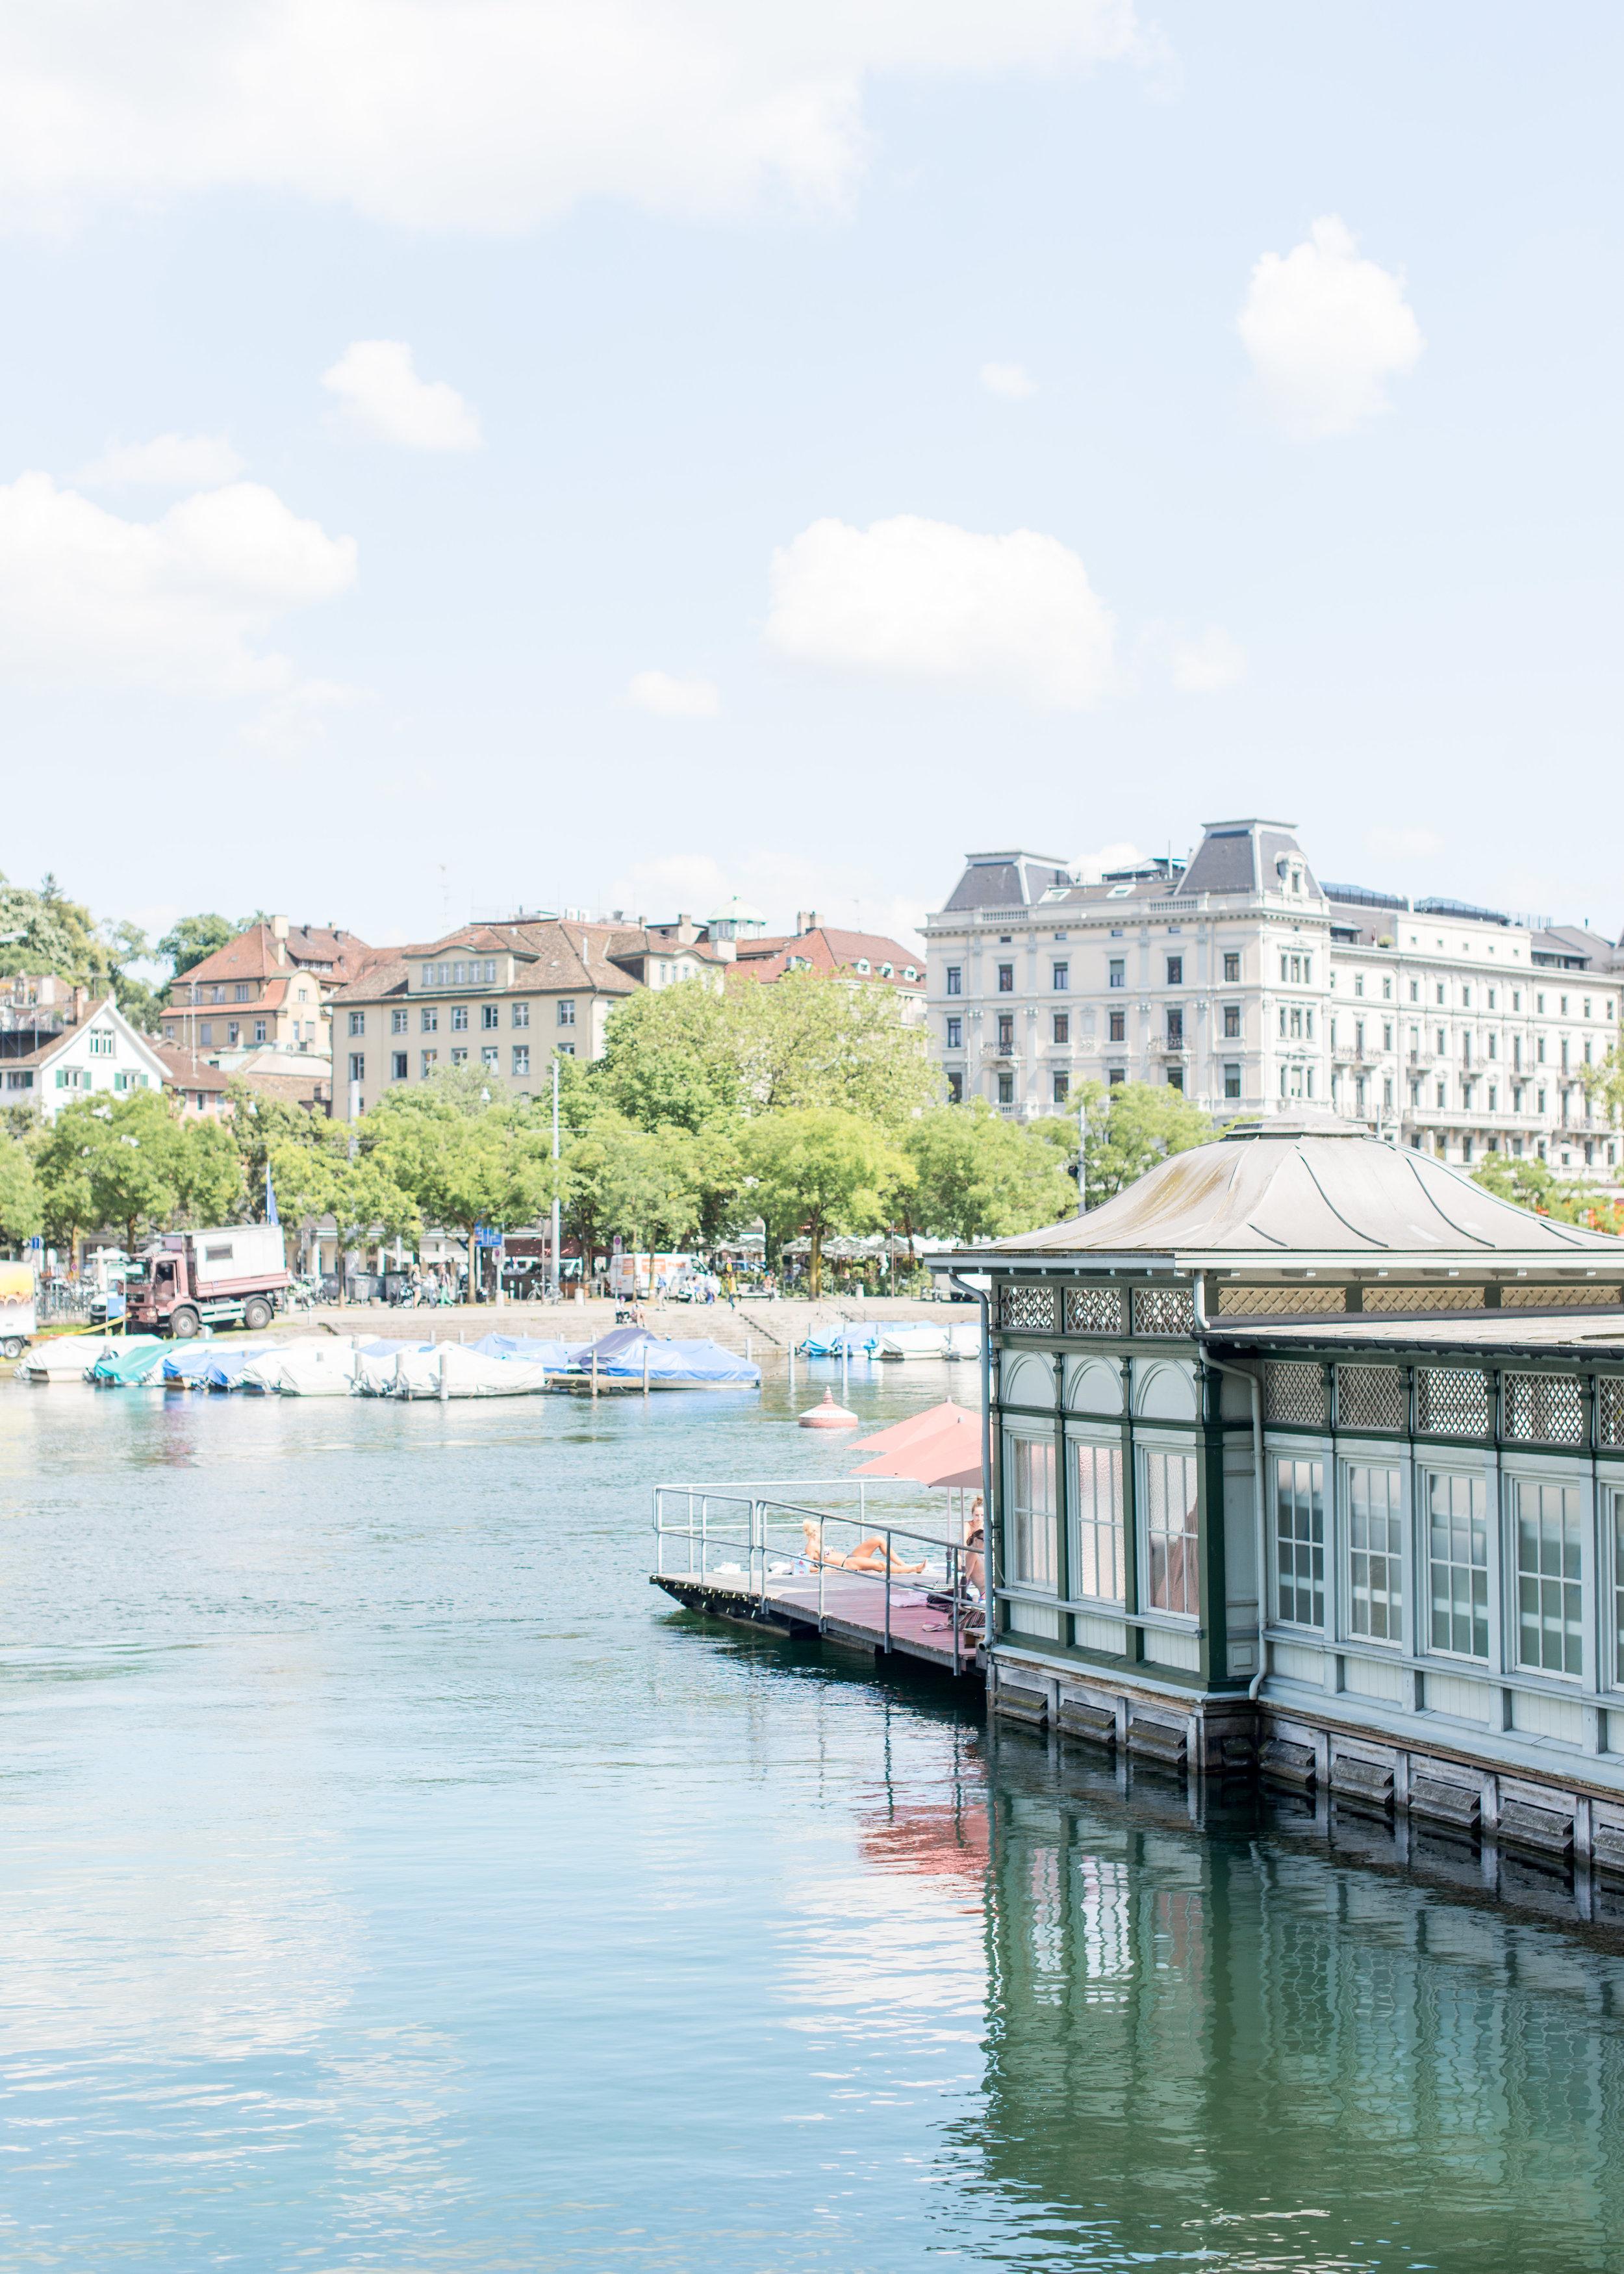 Frauenbad+Stadthausquai+Zurich+Carley+Rudd+Travel+Photographer.jpg